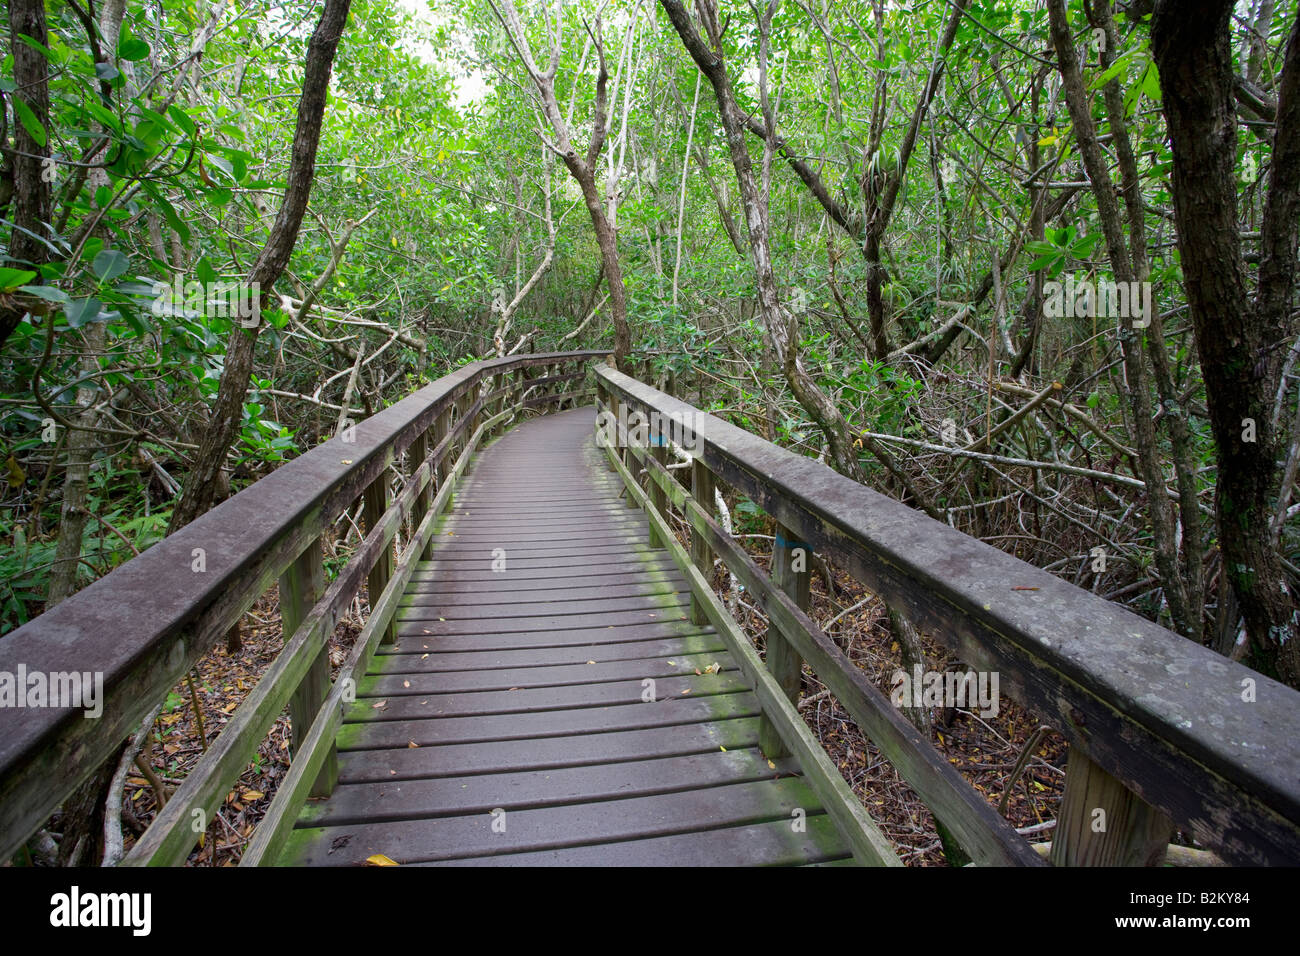 pathway through Everglades National Forest, Florida, USA - Stock Image